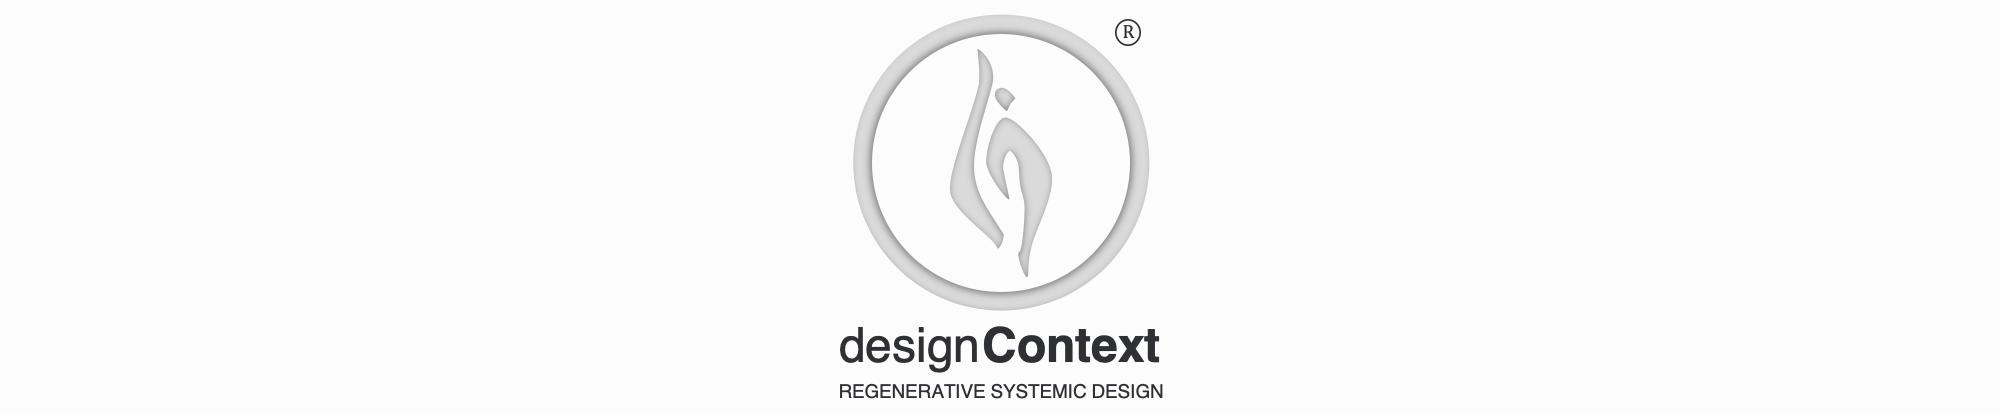 Agence designContext Logo